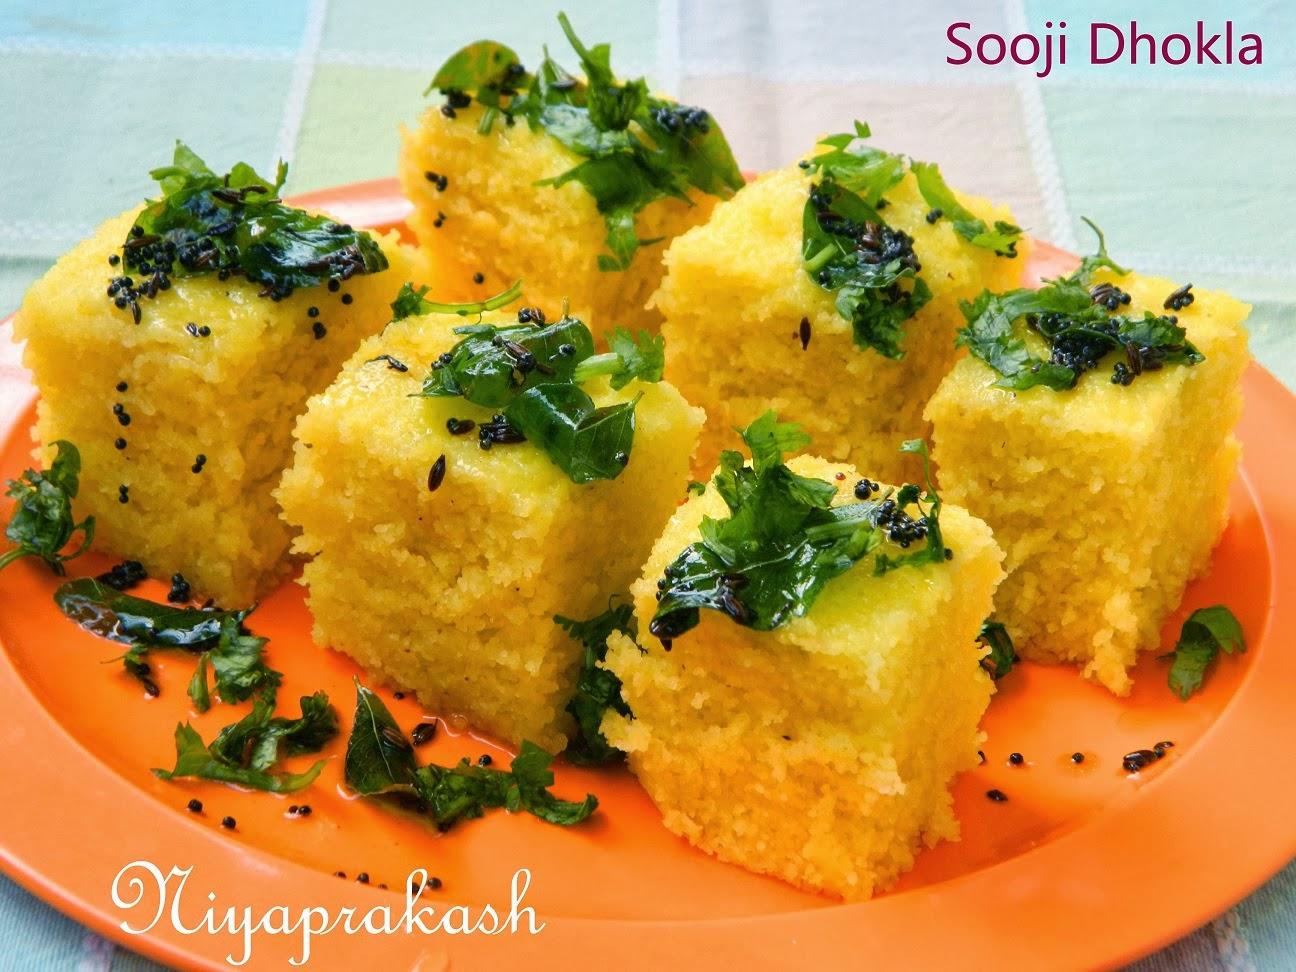 Niya S World Sooji Dhokla Rava Dhokla